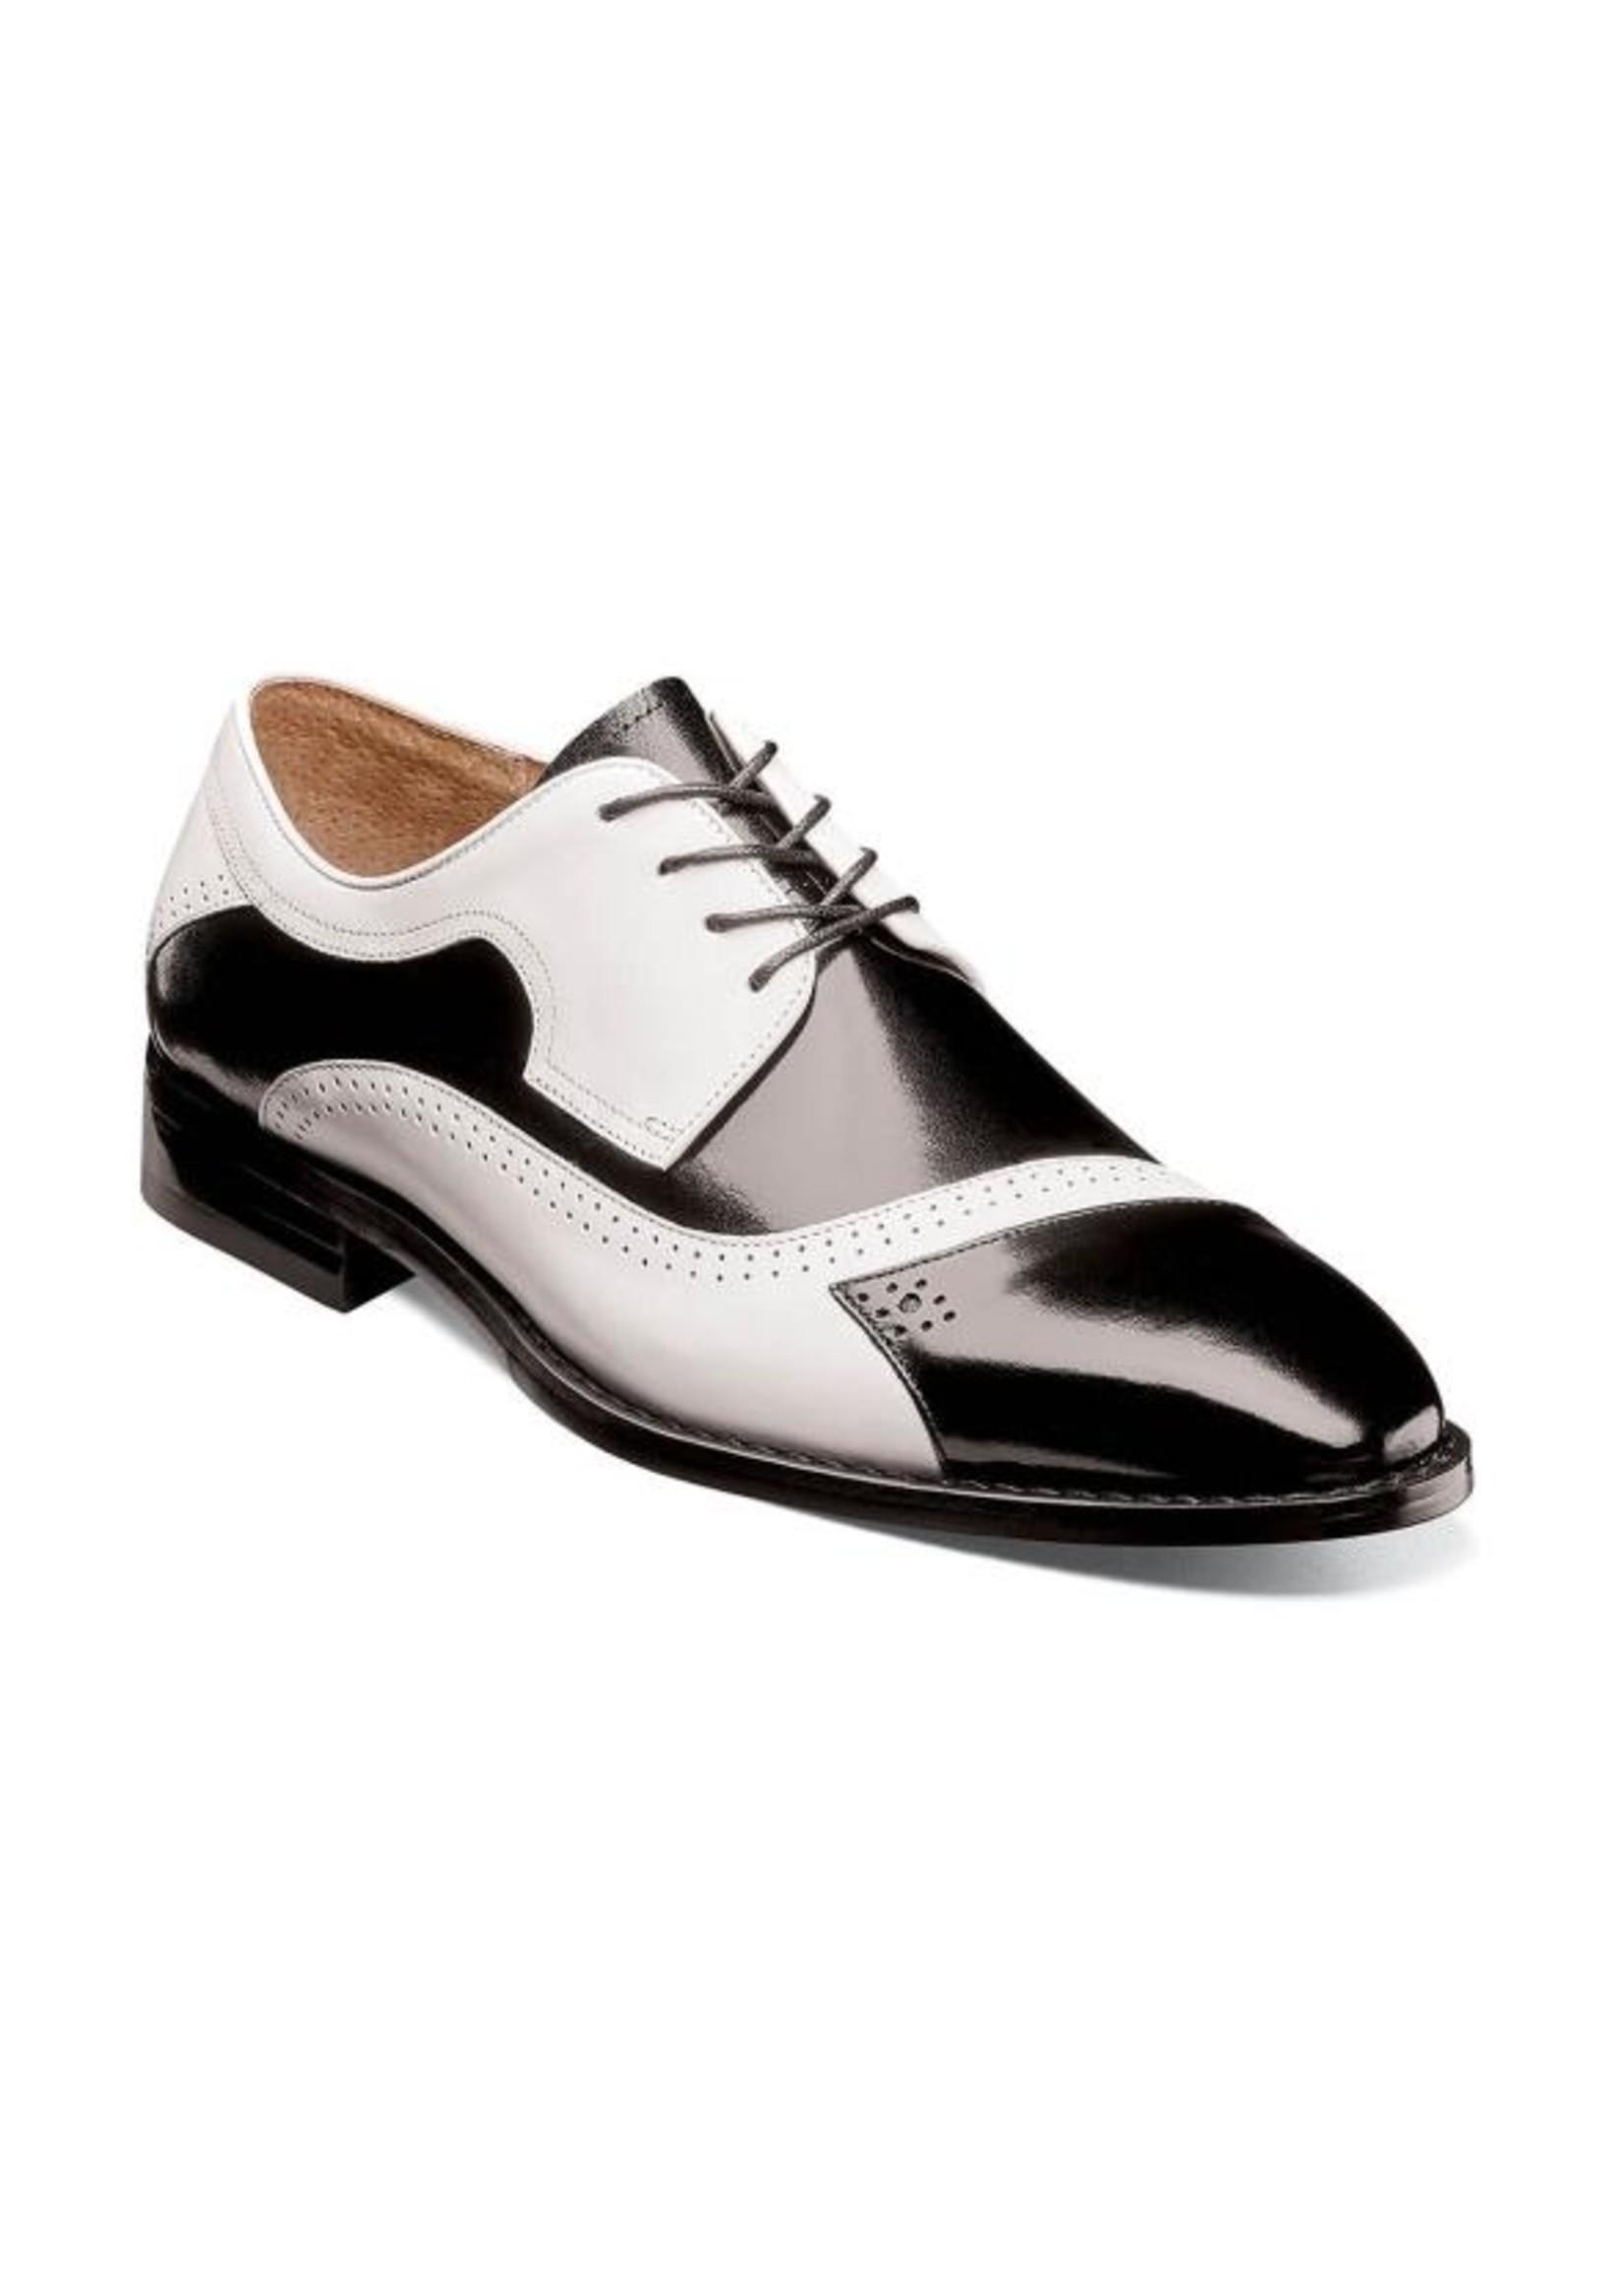 Stacy Adams Stacy Adams Paxton Dual Tone Shoe